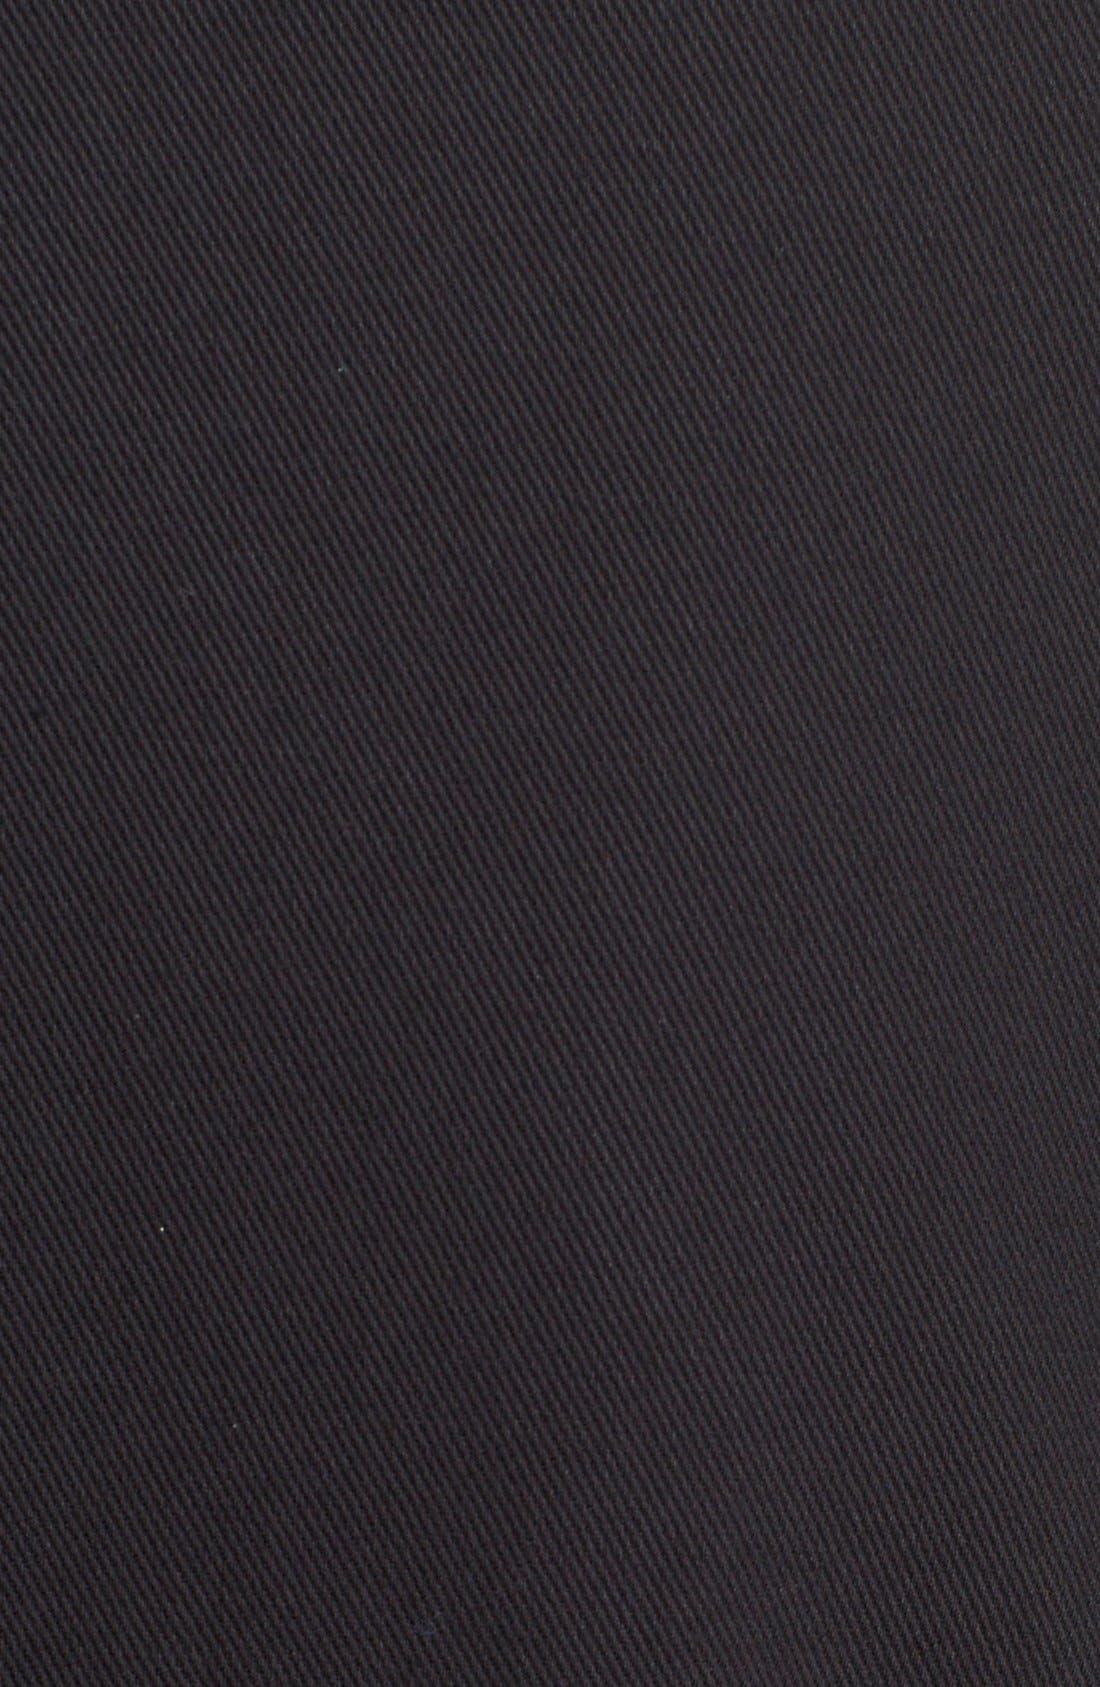 Alternate Image 3  - Max Mara 'Talpa' Stretch Cotton & Linen Jacket